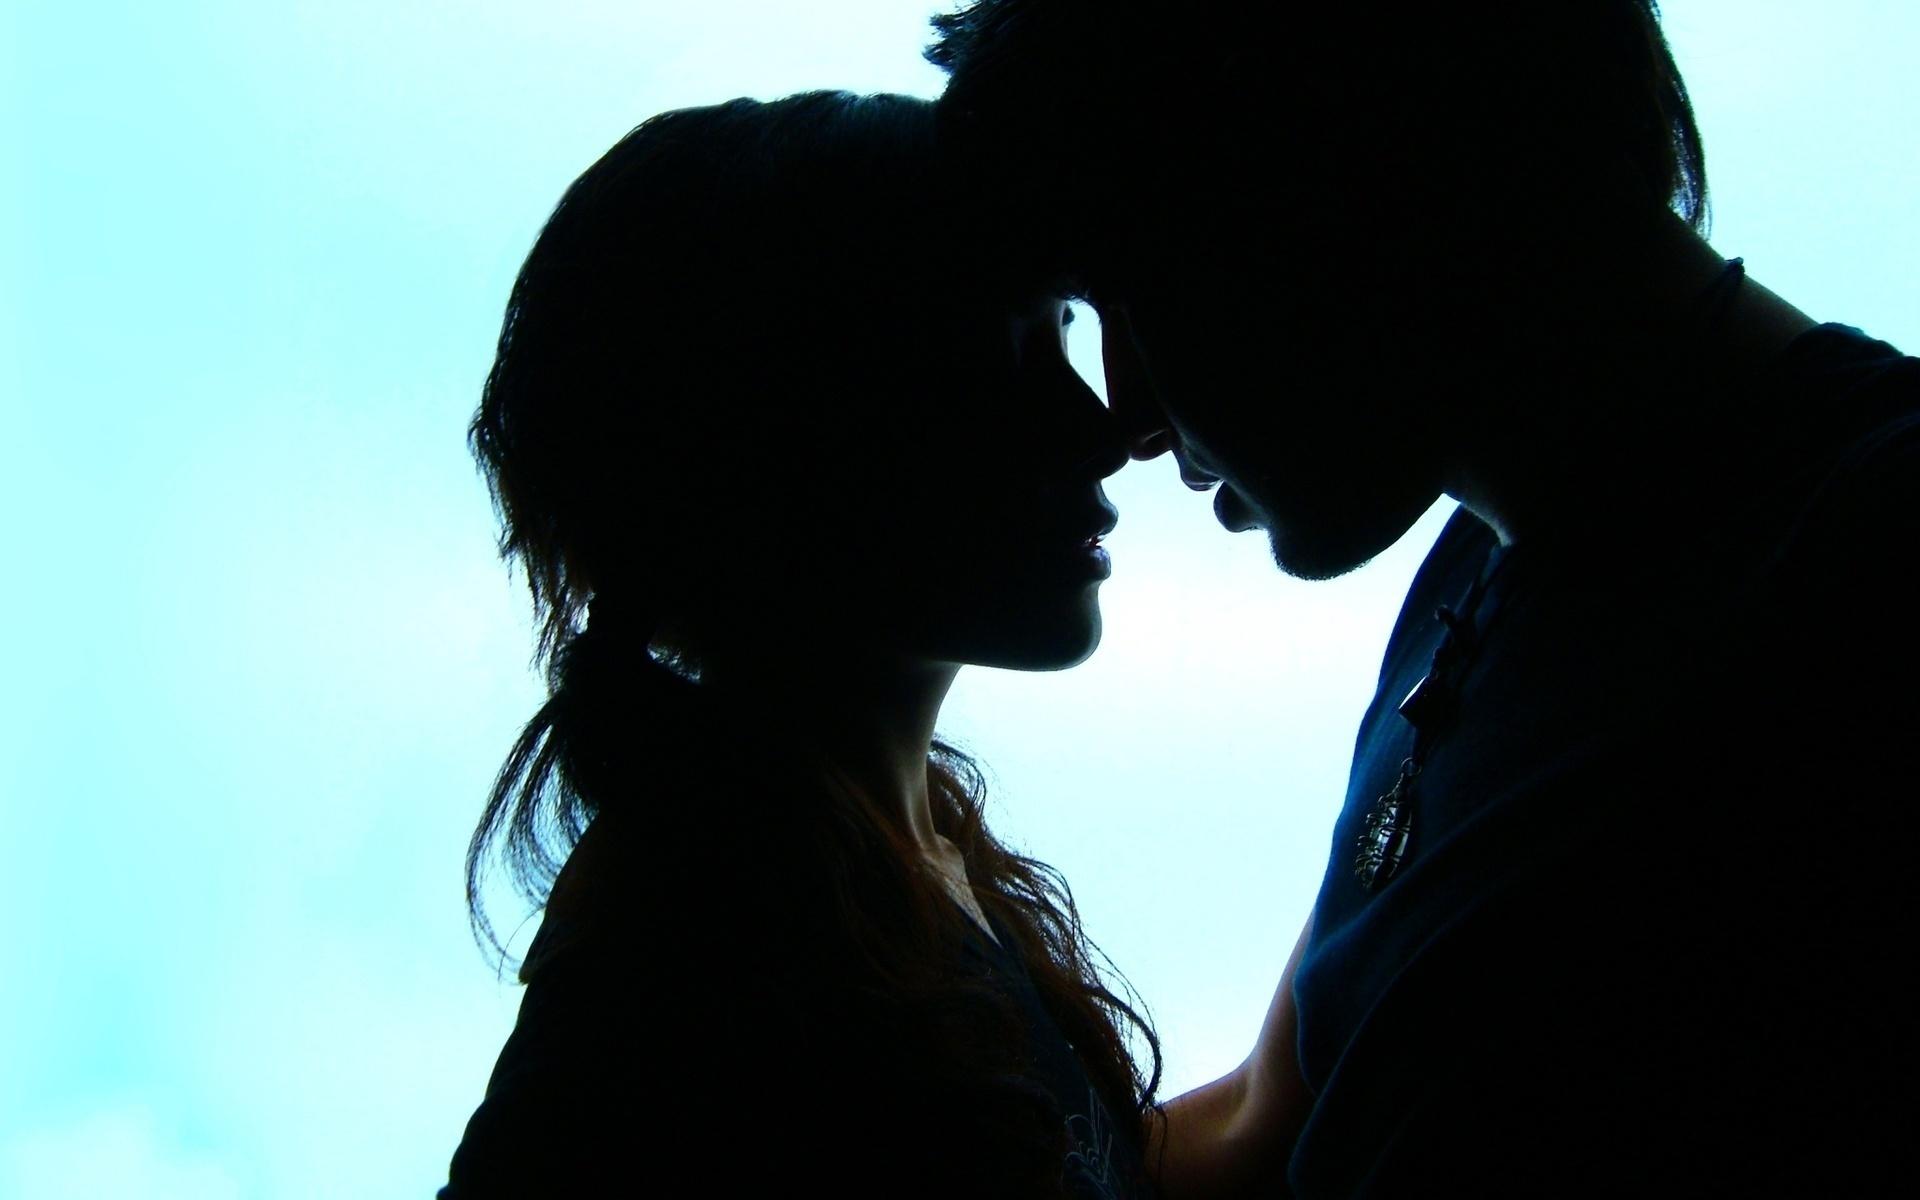 картинки на тему целующиеся можно надеть волшебную